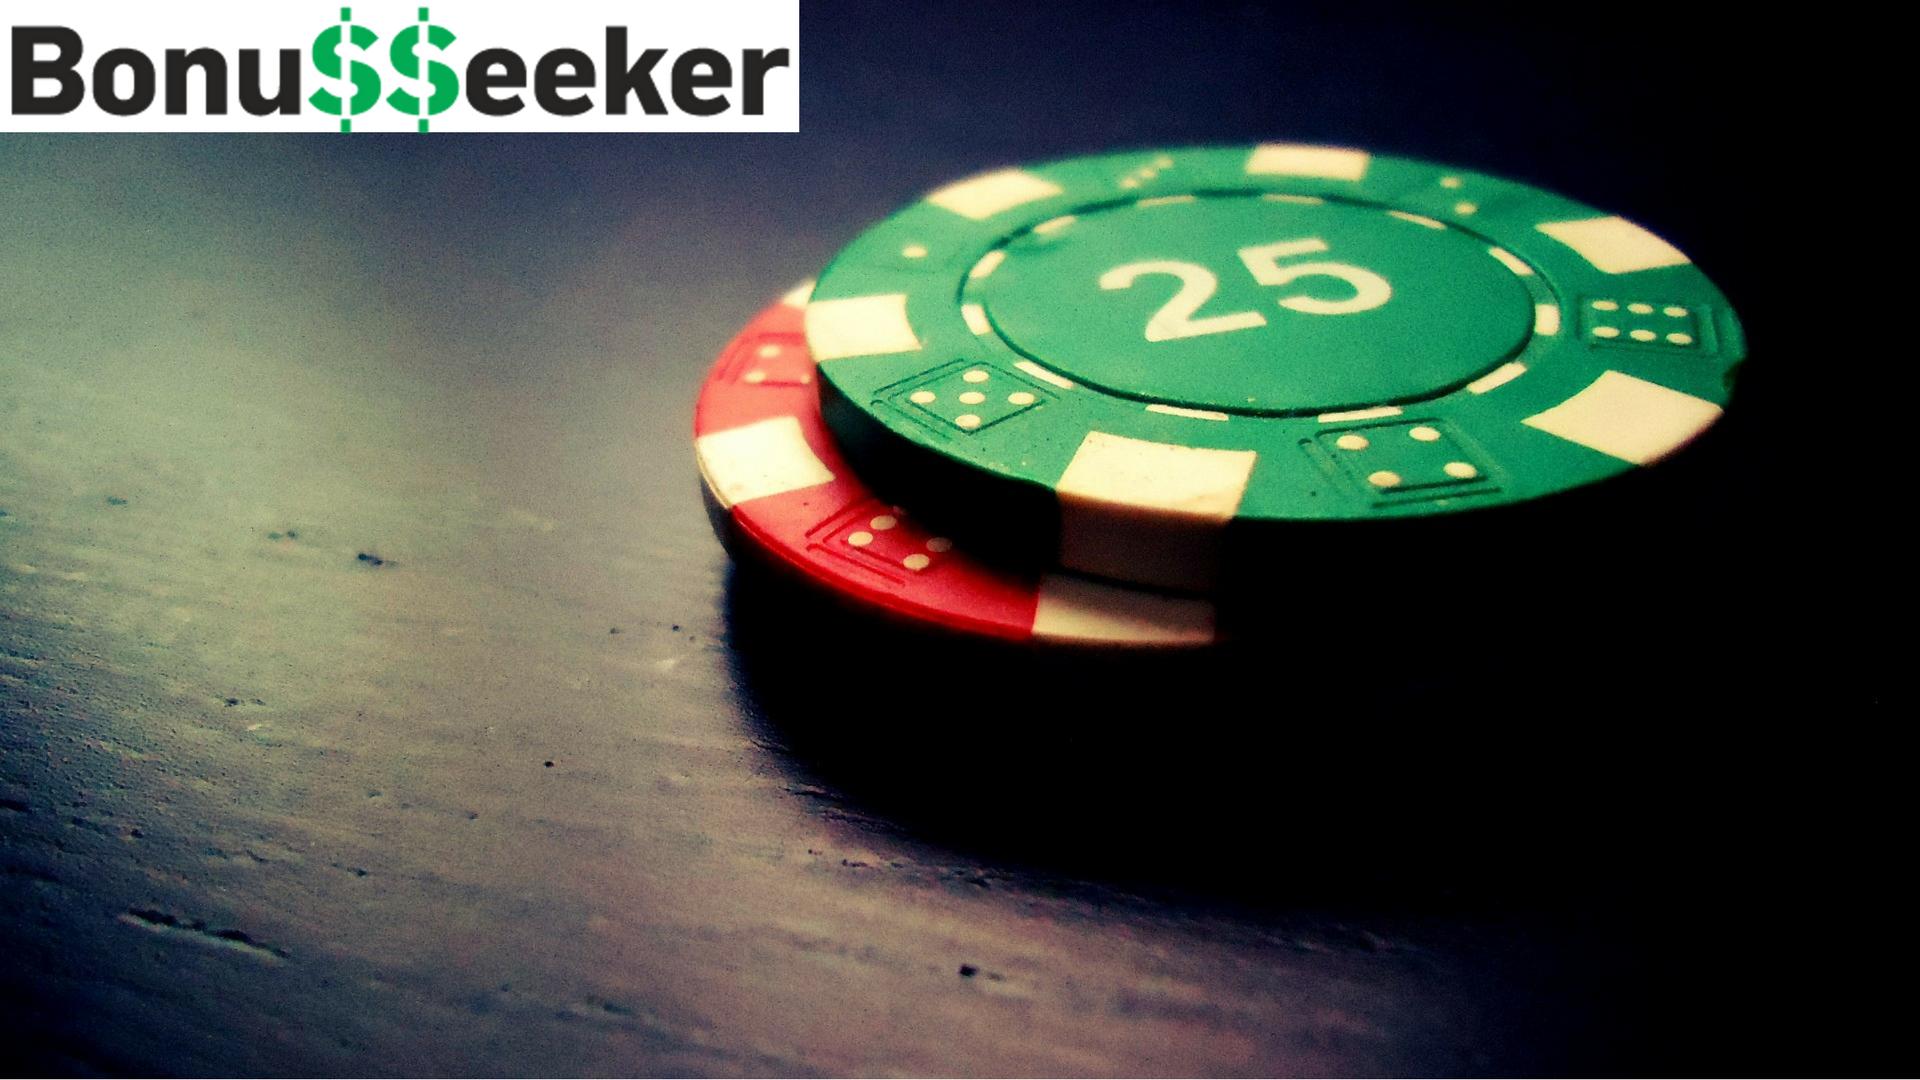 playMGM Online Casino Free Play Bonus